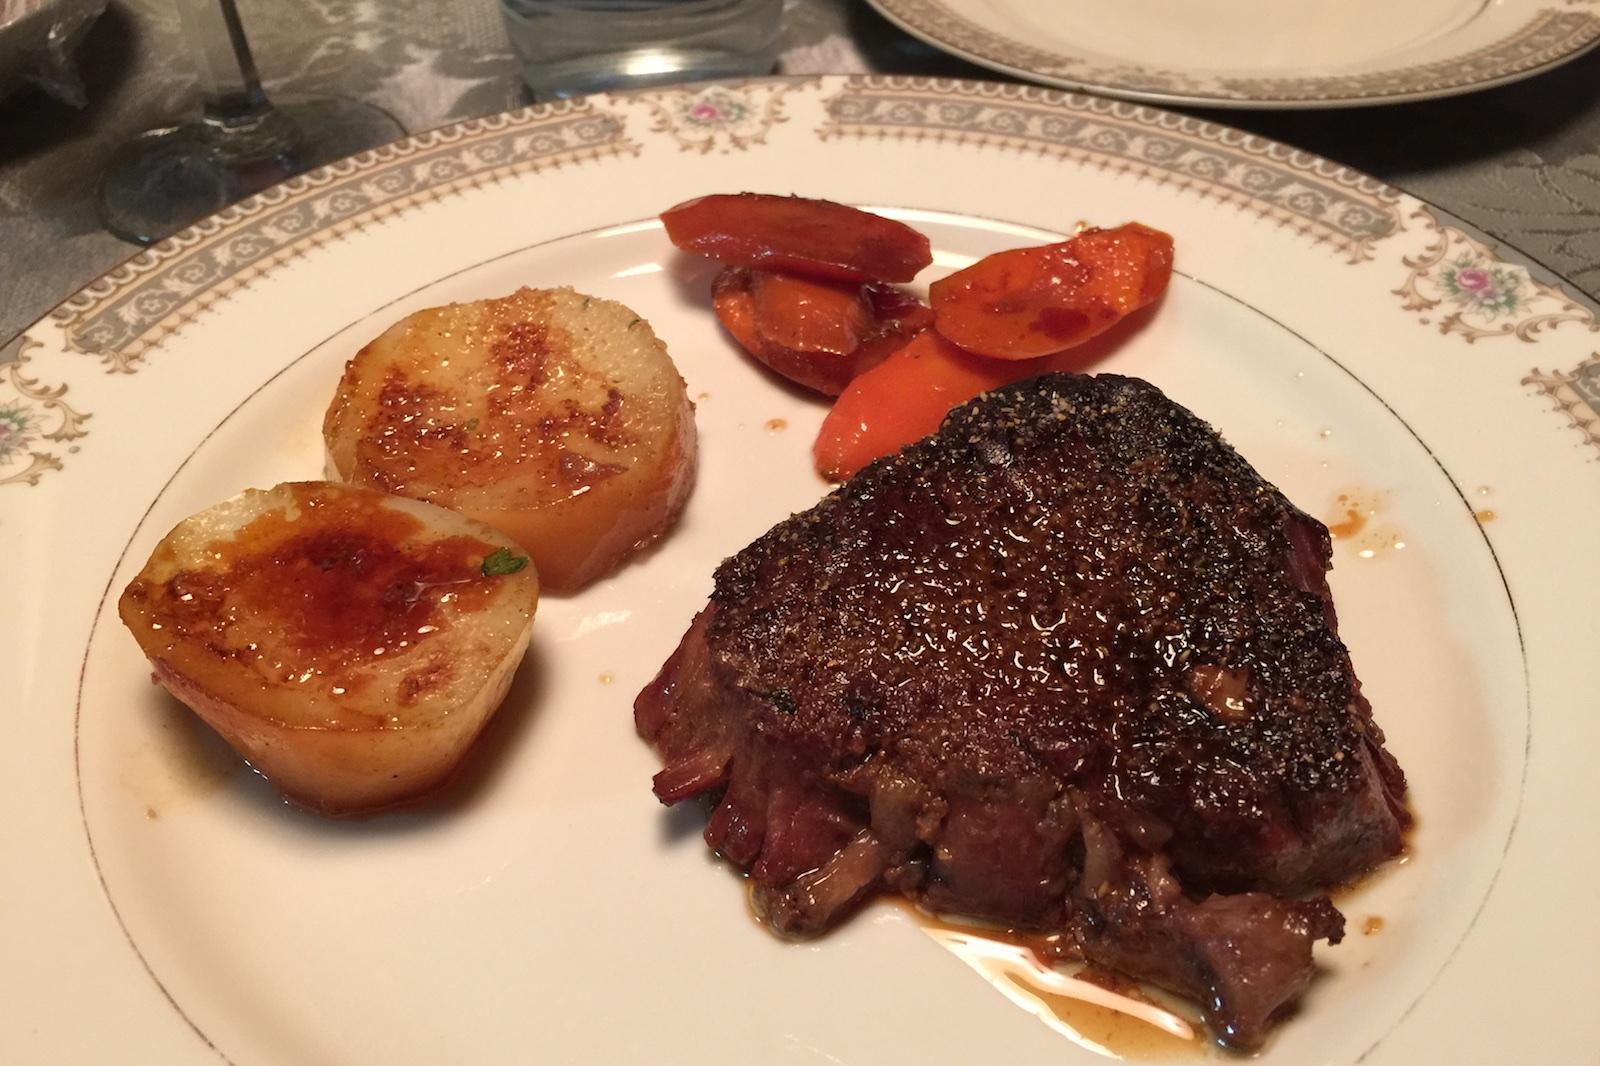 http://blog.rickk.com/food/2014/11/30/ate.2014.11.29.d.jpg